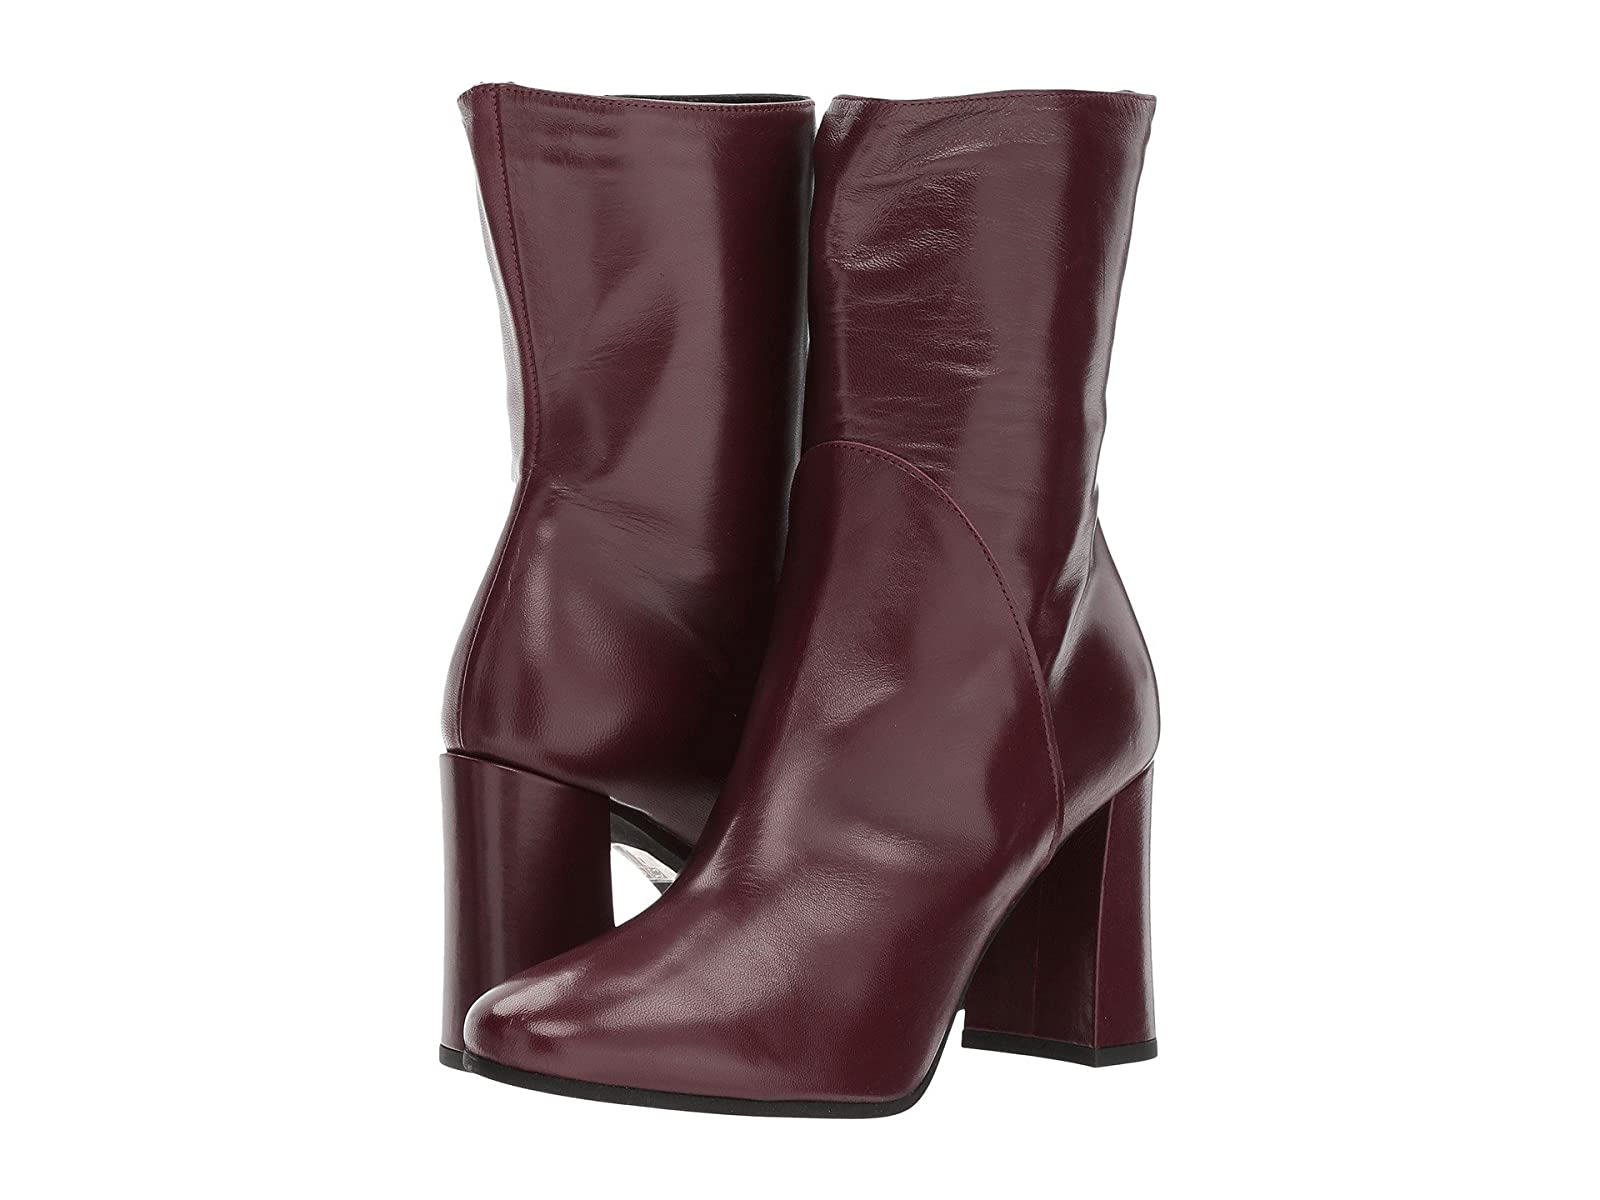 Cordani HermesCheap and distinctive eye-catching shoes